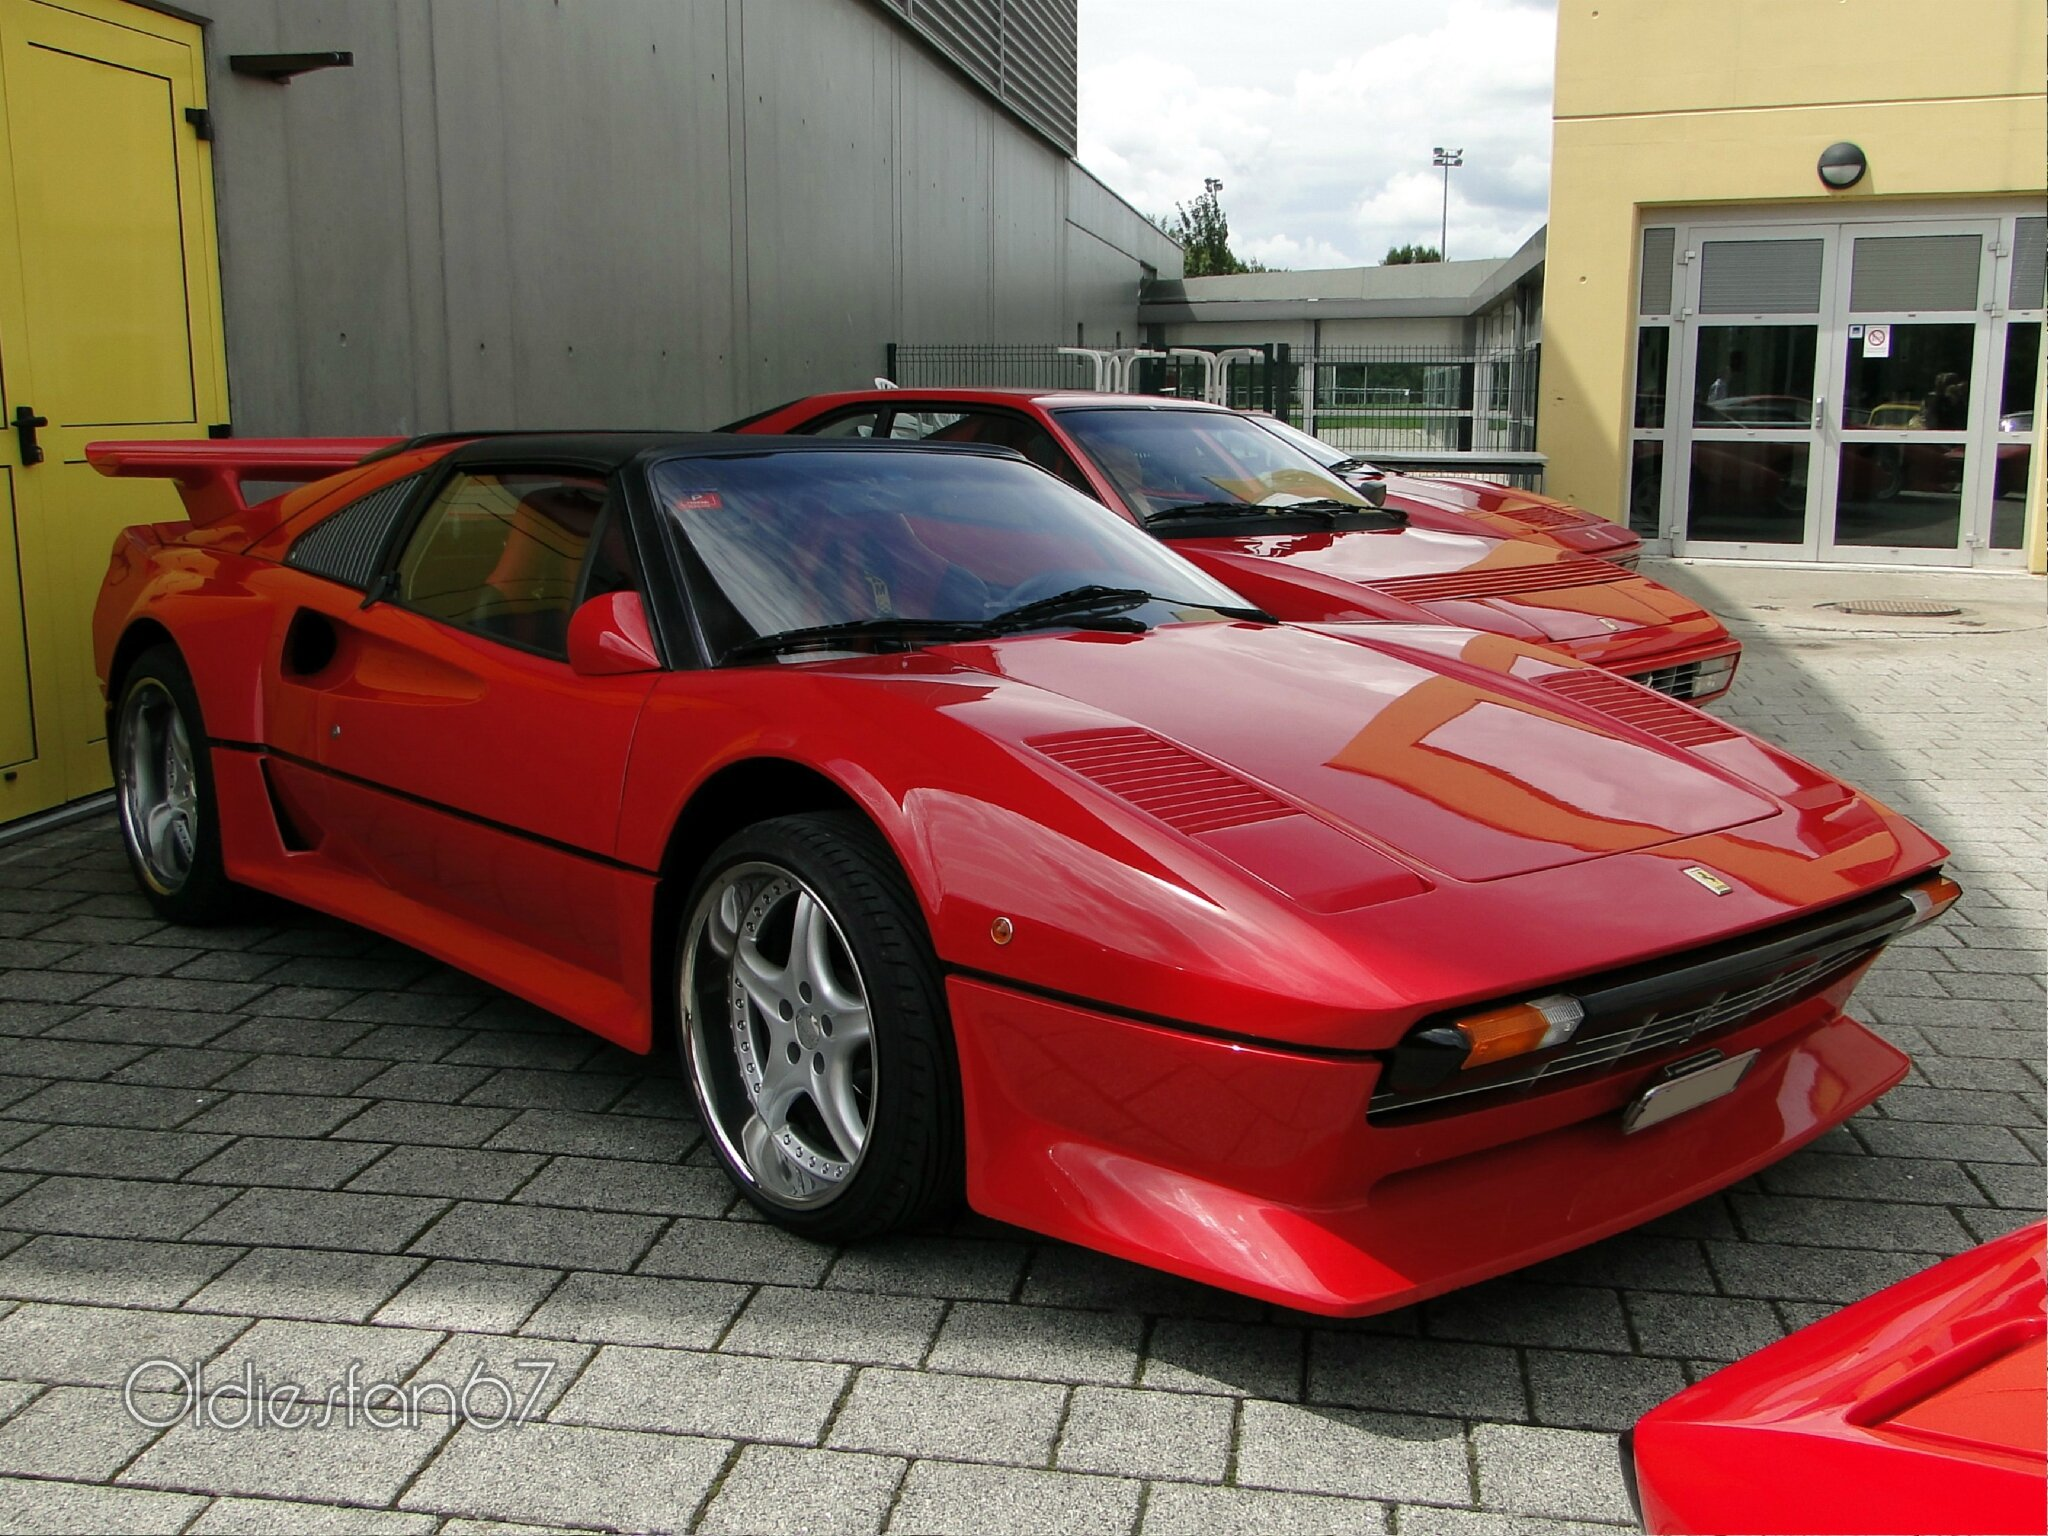 ferrari-308-gts-1975-1985-c